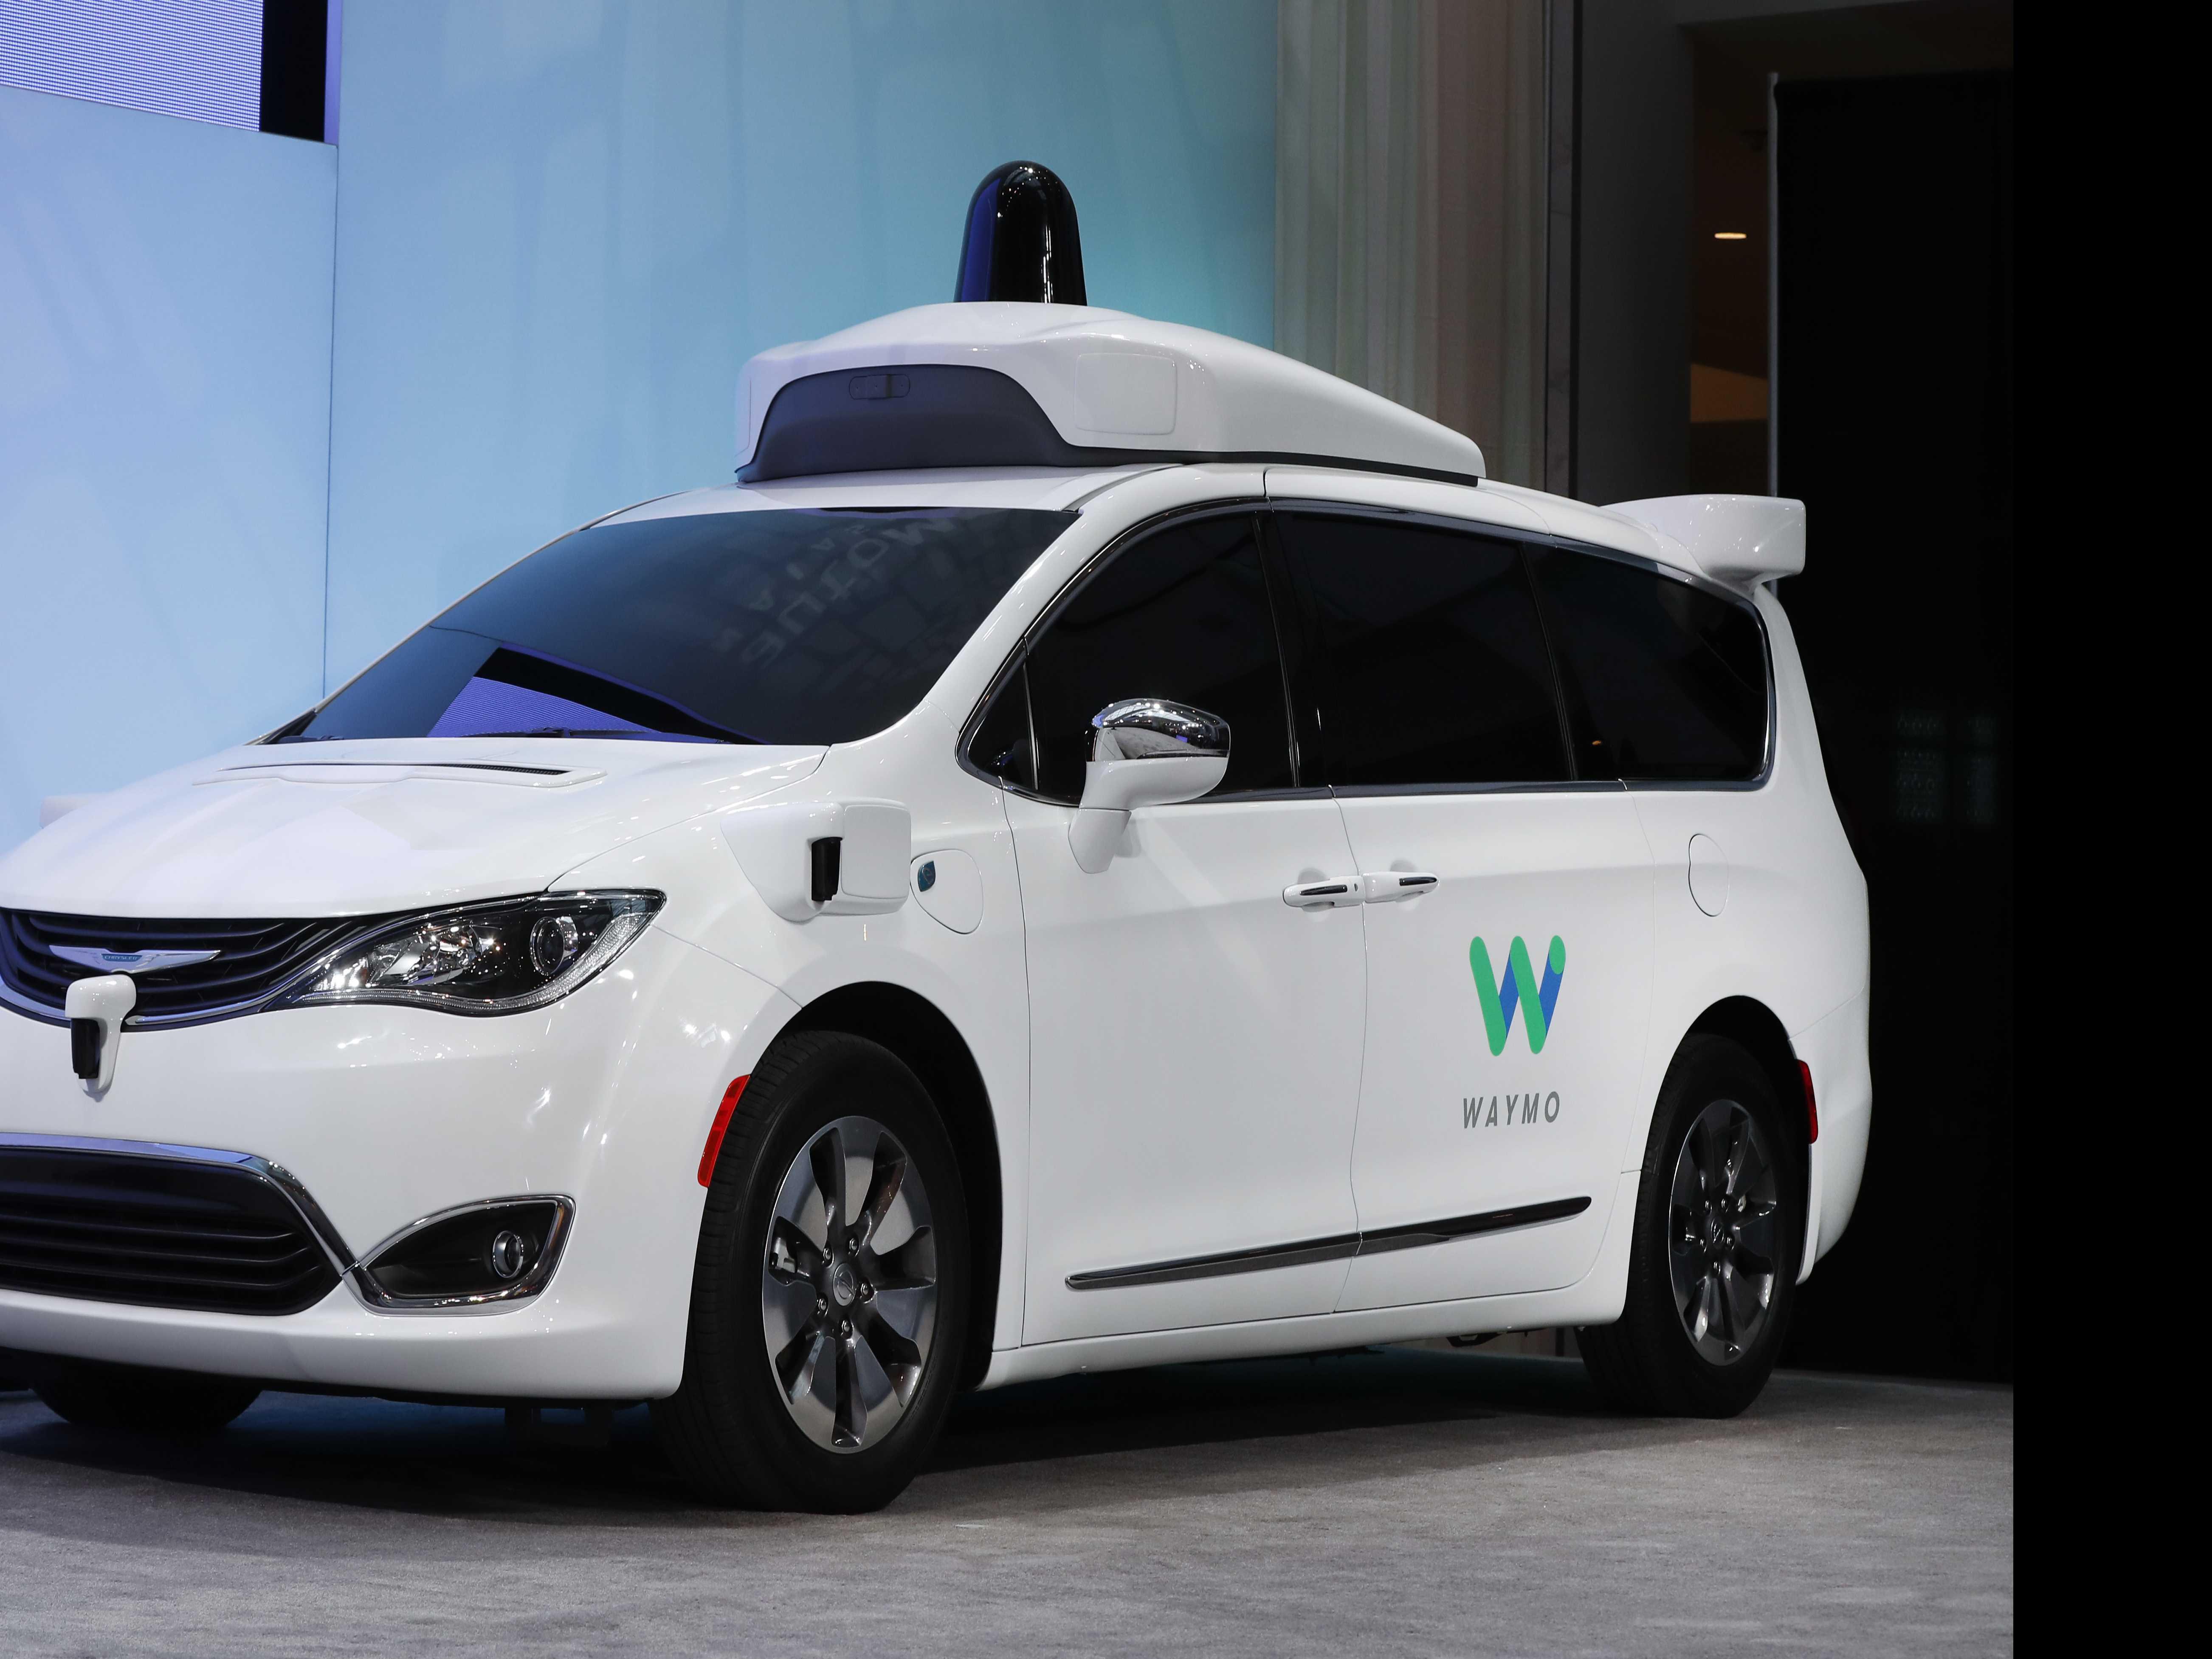 Google and AutoNation Partner on Self-Driving Car Program